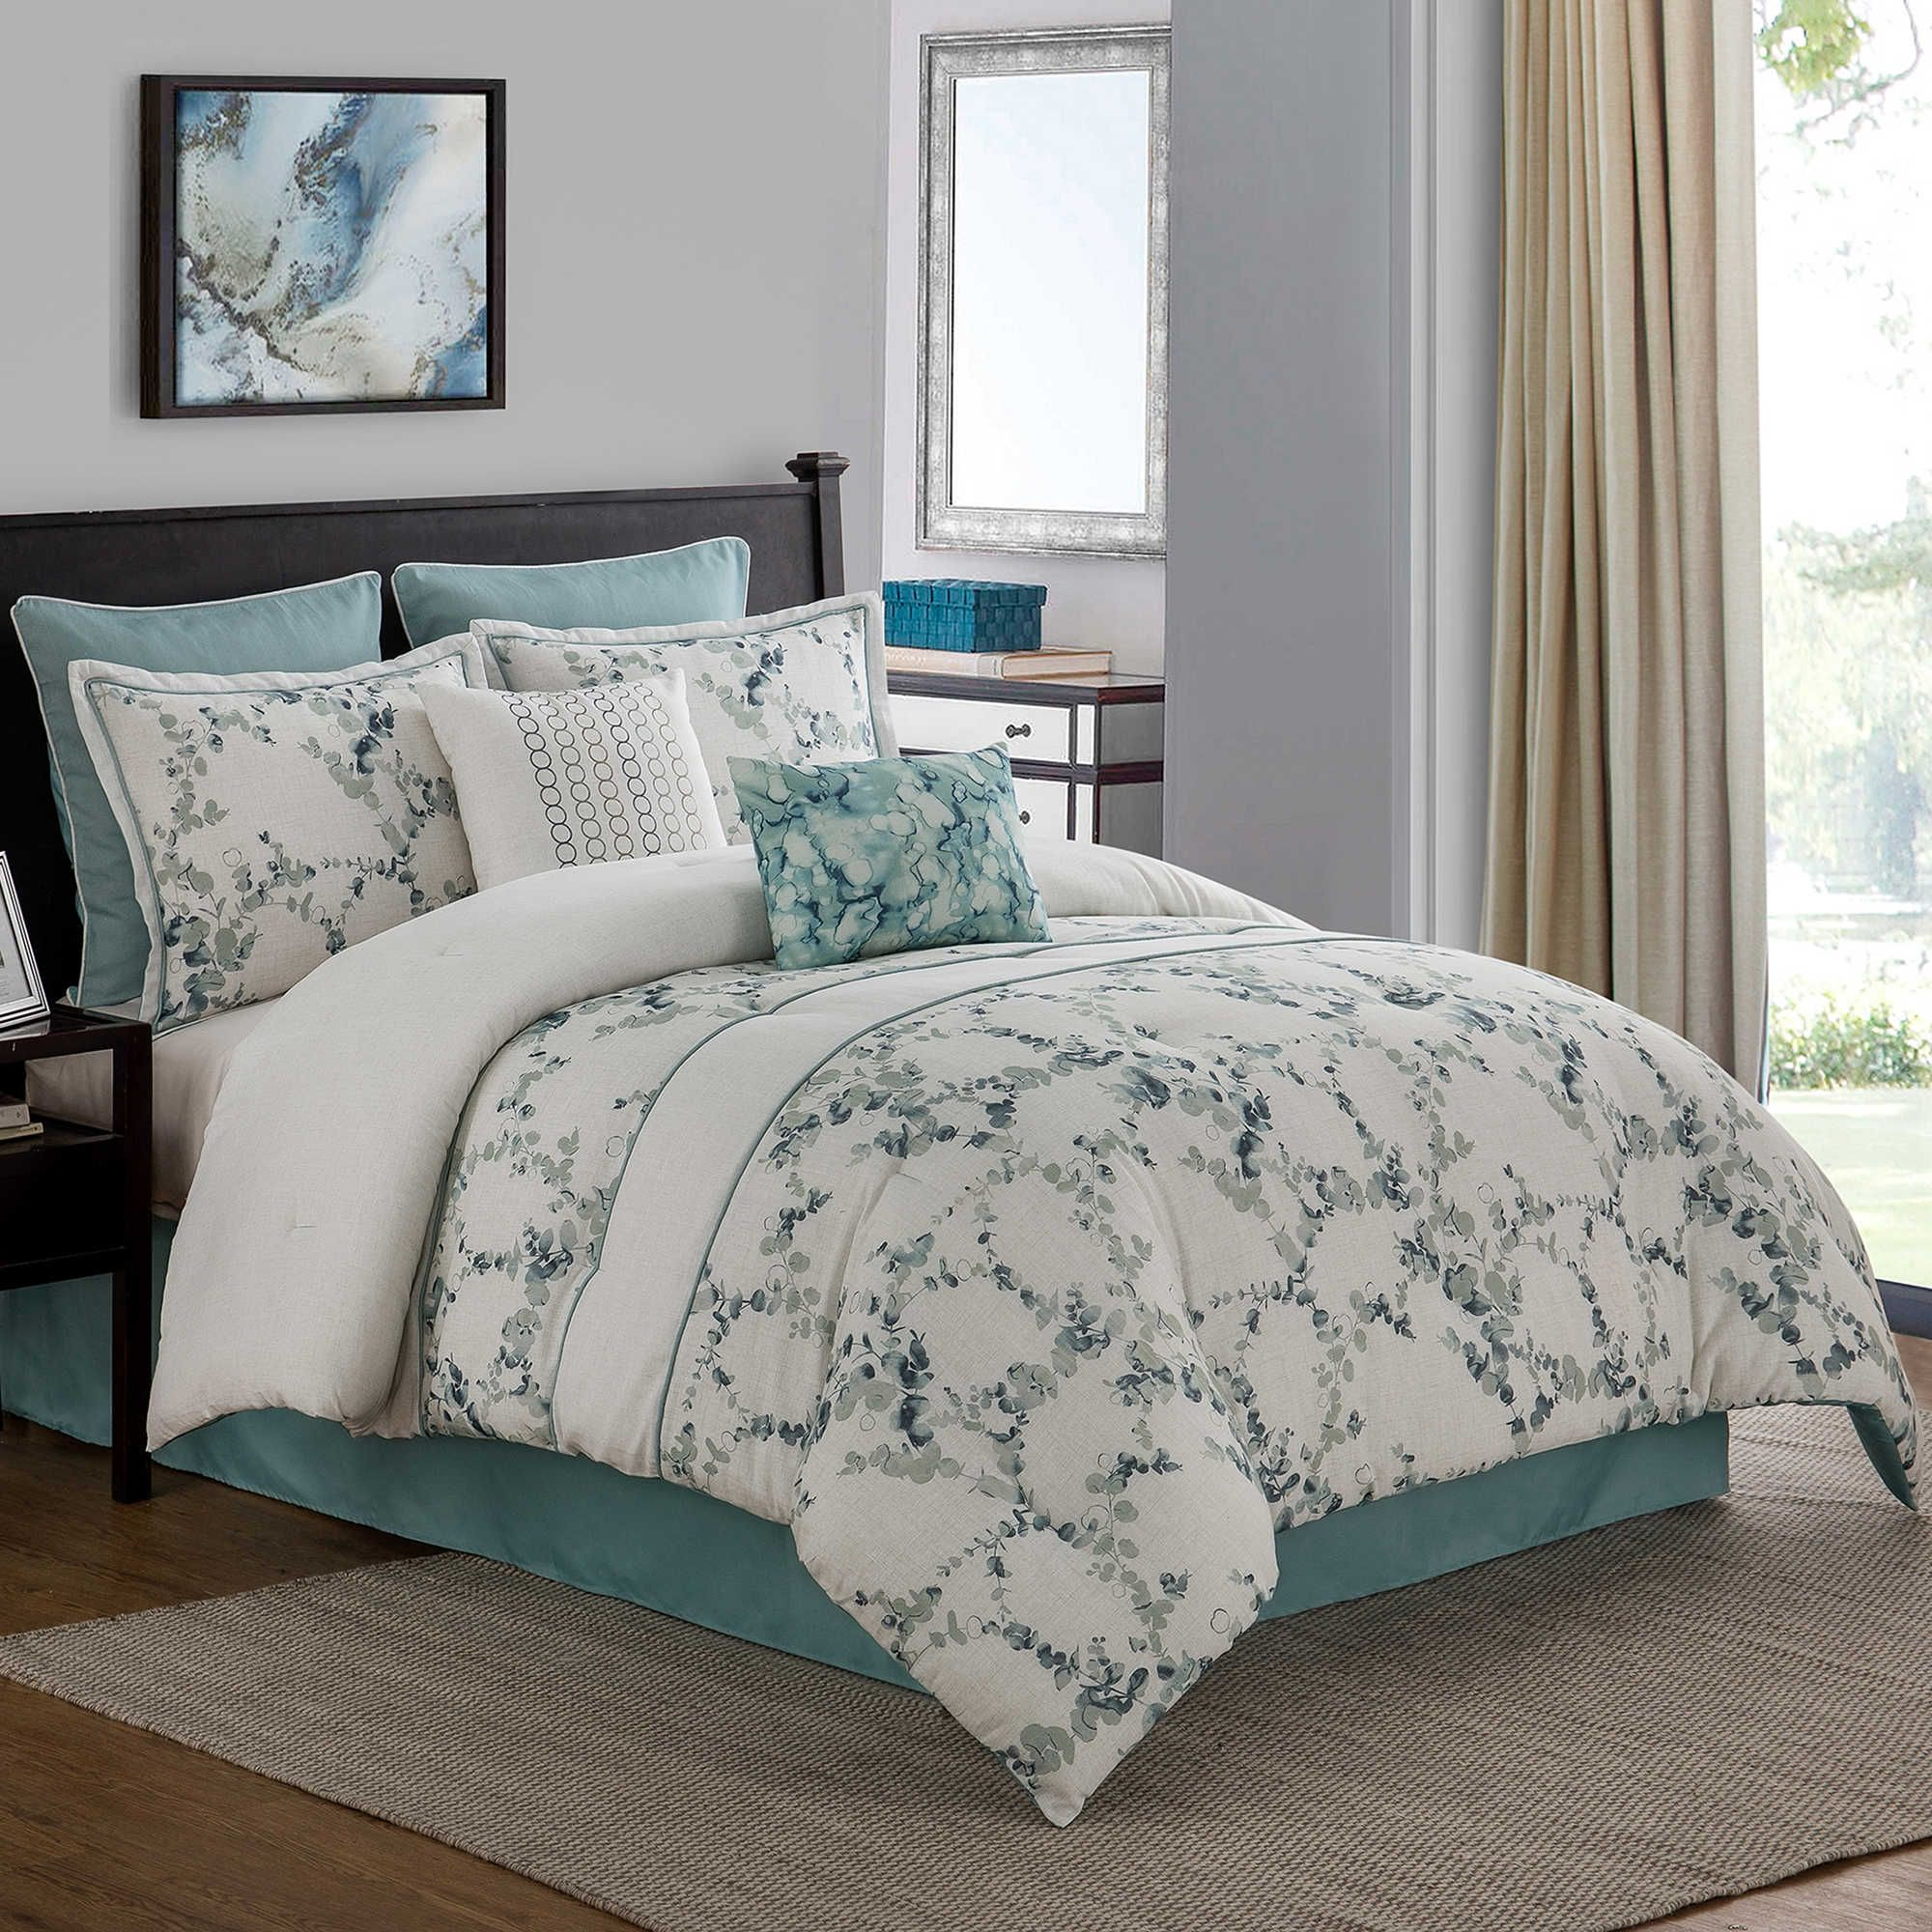 Meadow 8 Piece King Comforter Set In Aqua Comforter Sets Aqua Bedding Bed Comforter Sets King sheet sets on sale